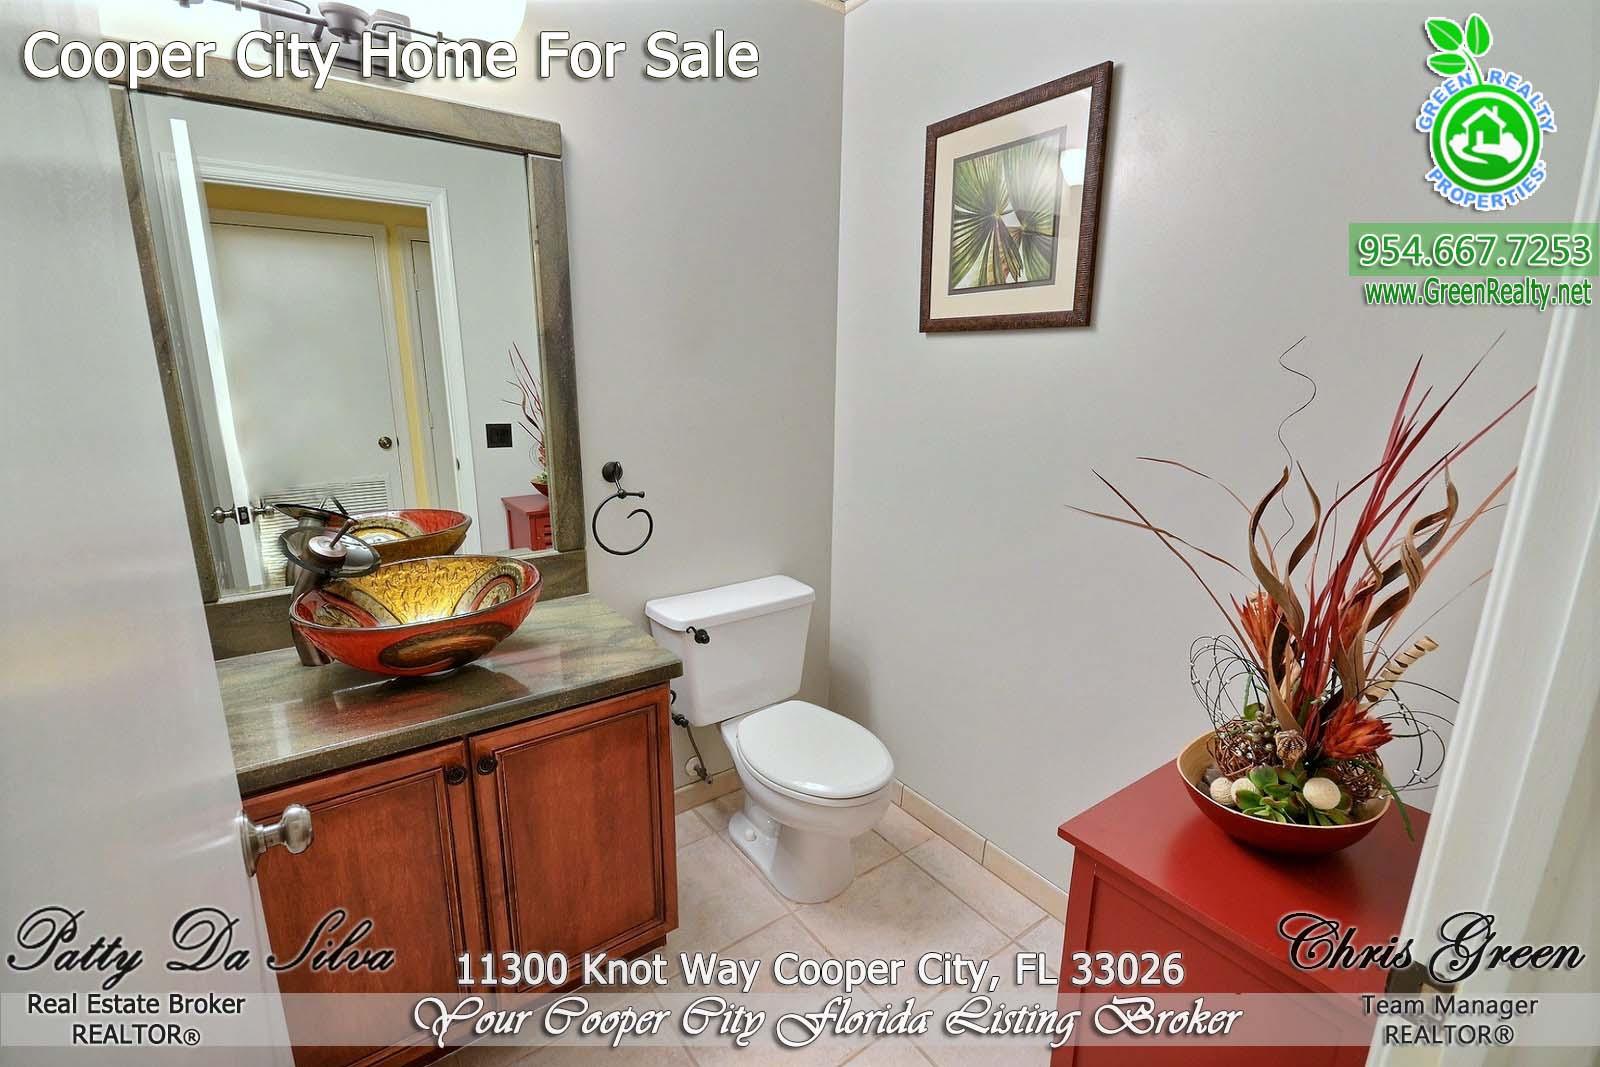 31 Cooper City Real Estate Agents (4)